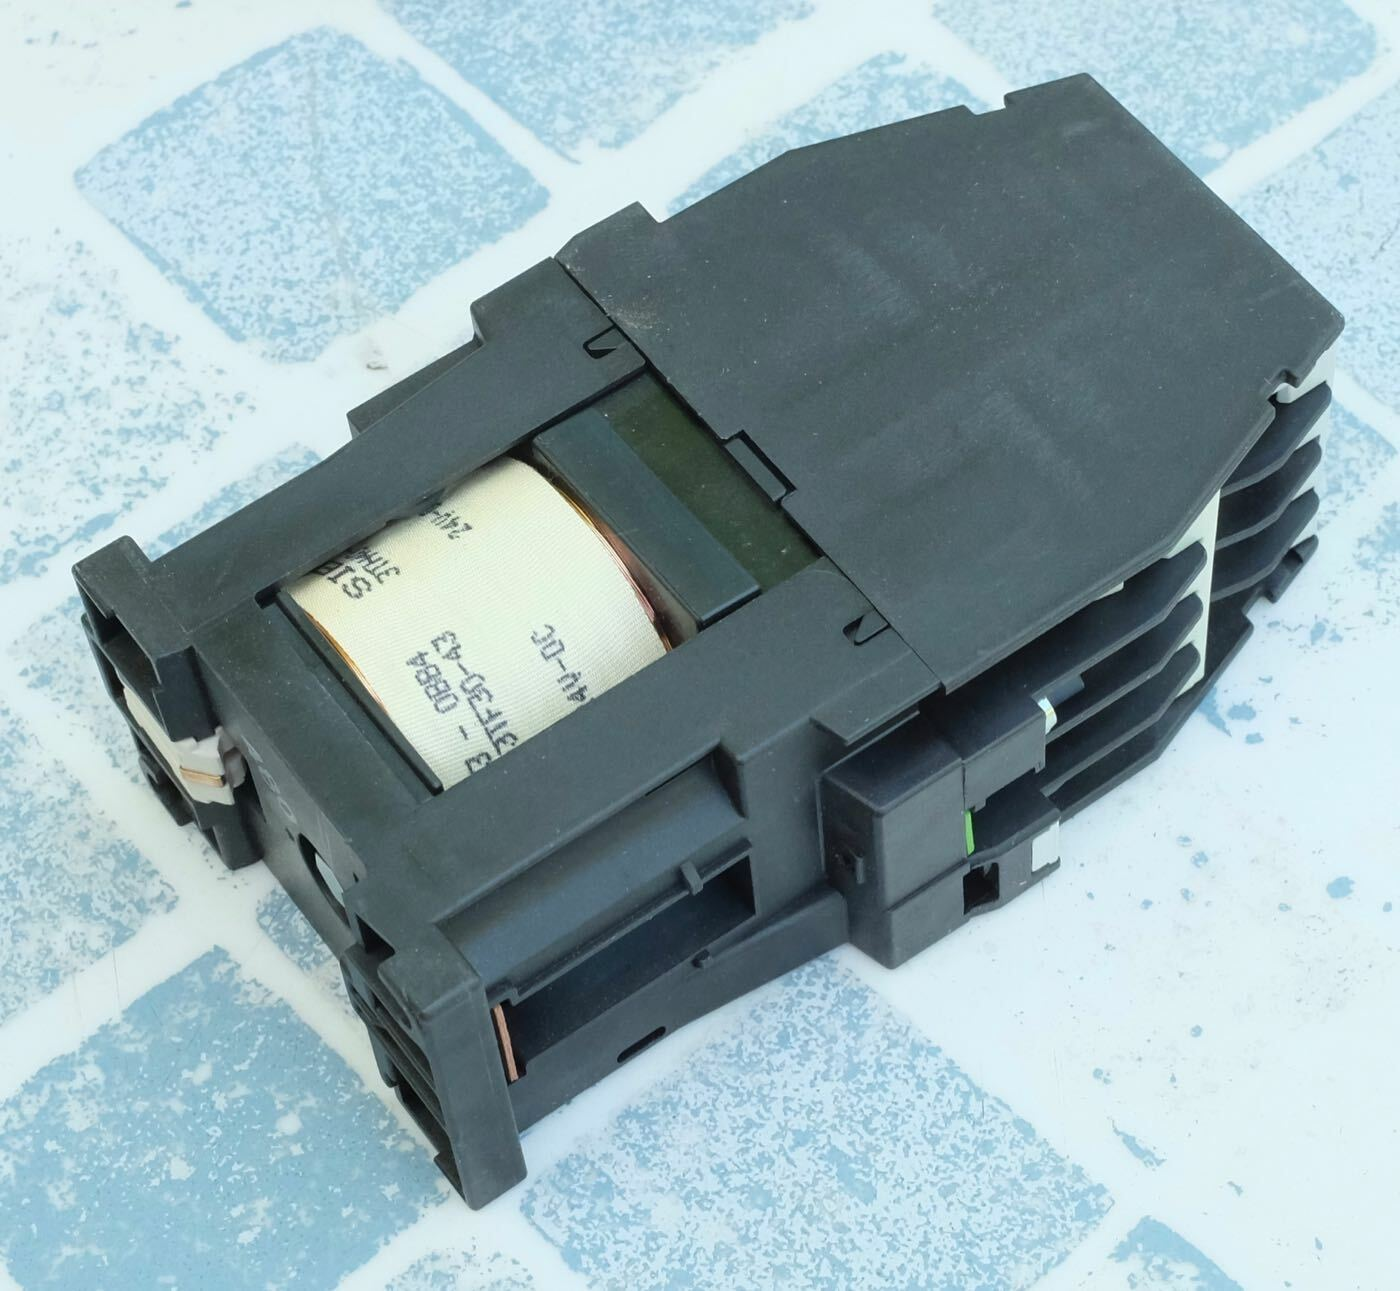 Siemens 3TH4253-0BB4 Contacteur Auxiliaire Control Relay, DC Oper, 24V, 5NO 3NC - 50,00 €